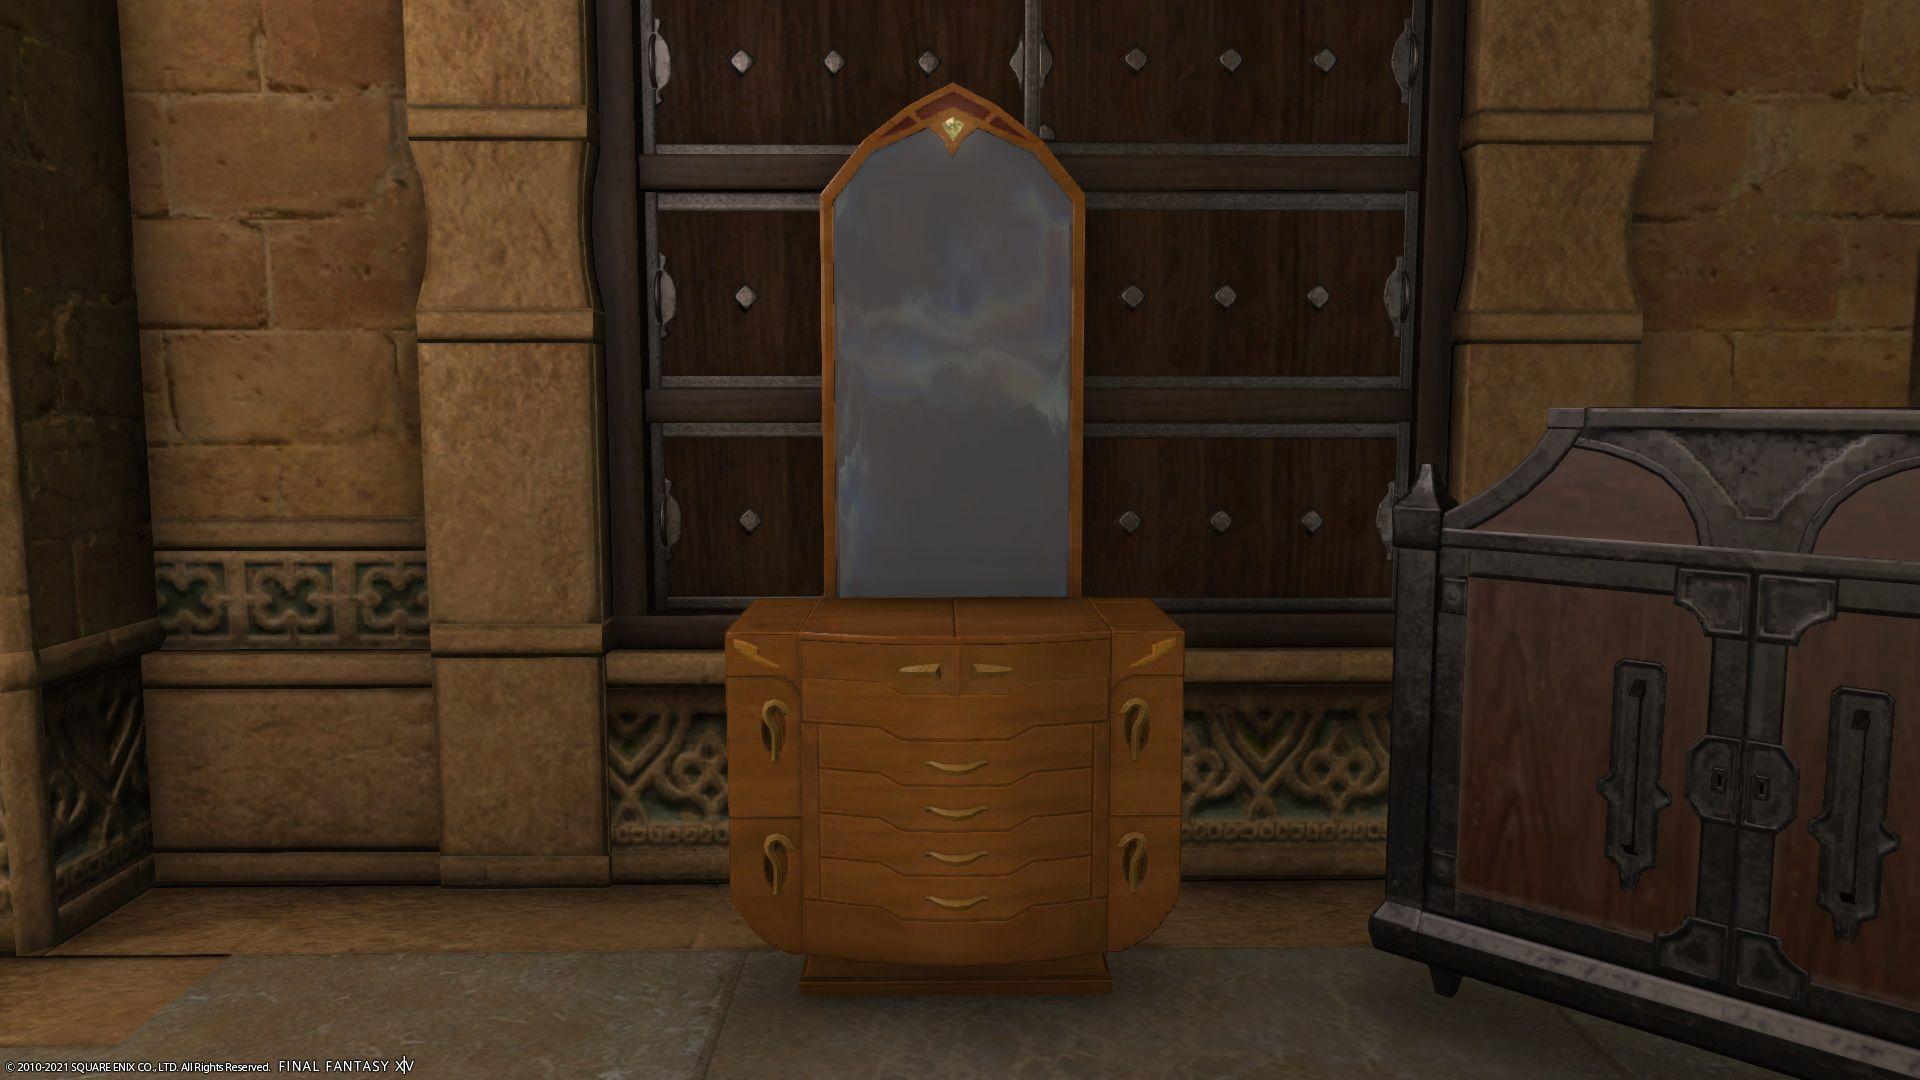 FFXIV Glamour Dresser